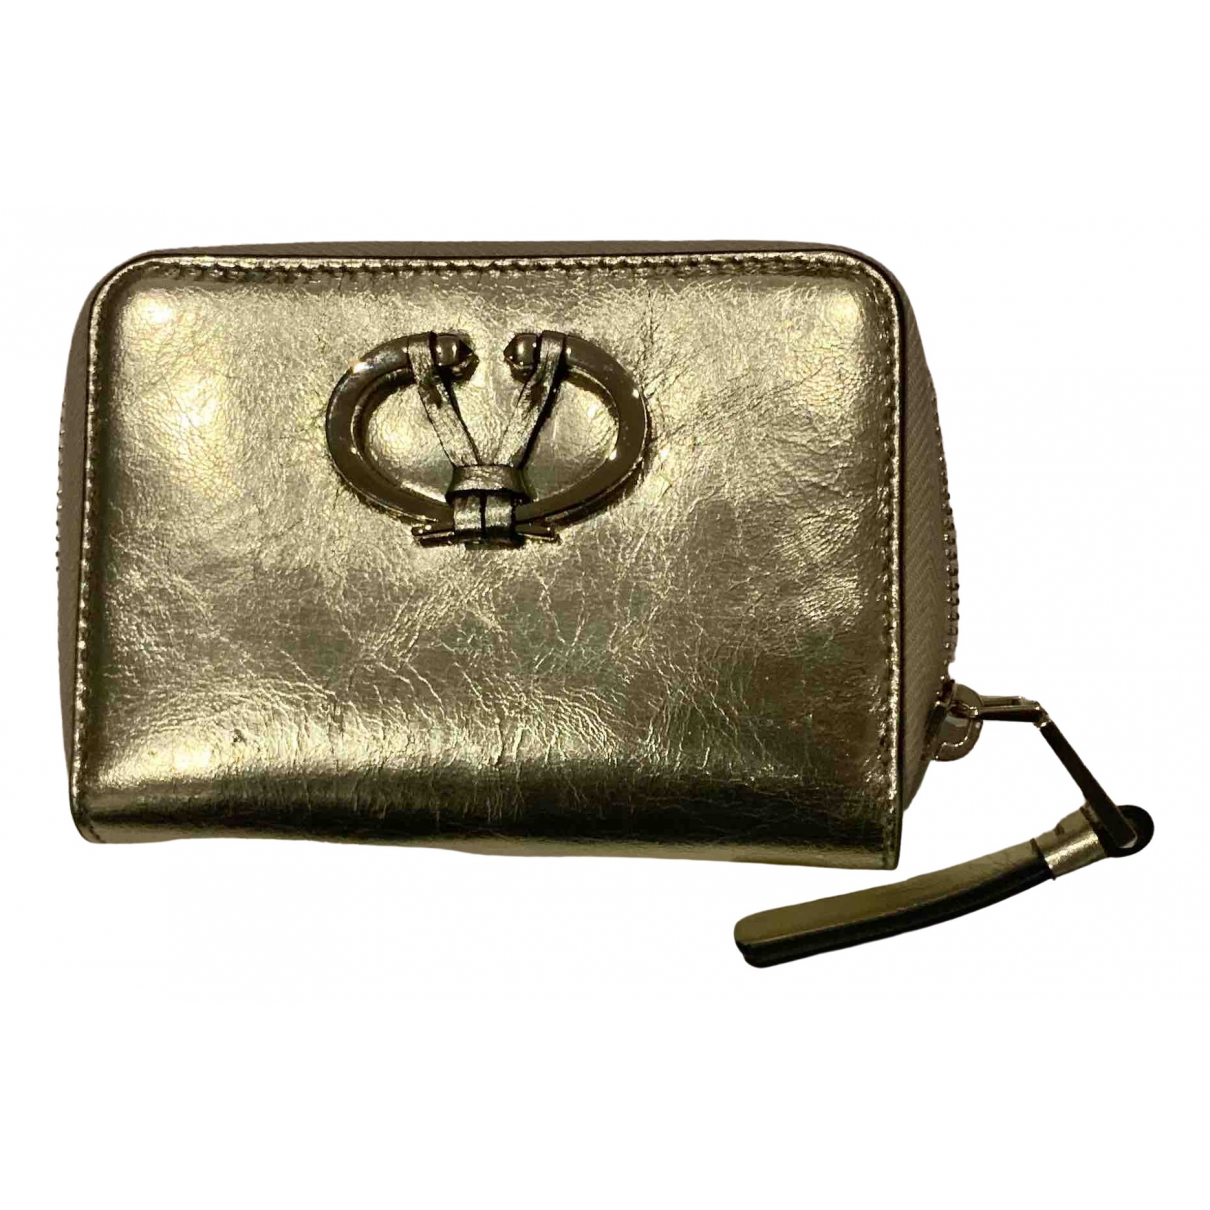 Valentino Garavani - Petite maroquinerie   pour femme en cuir - dore